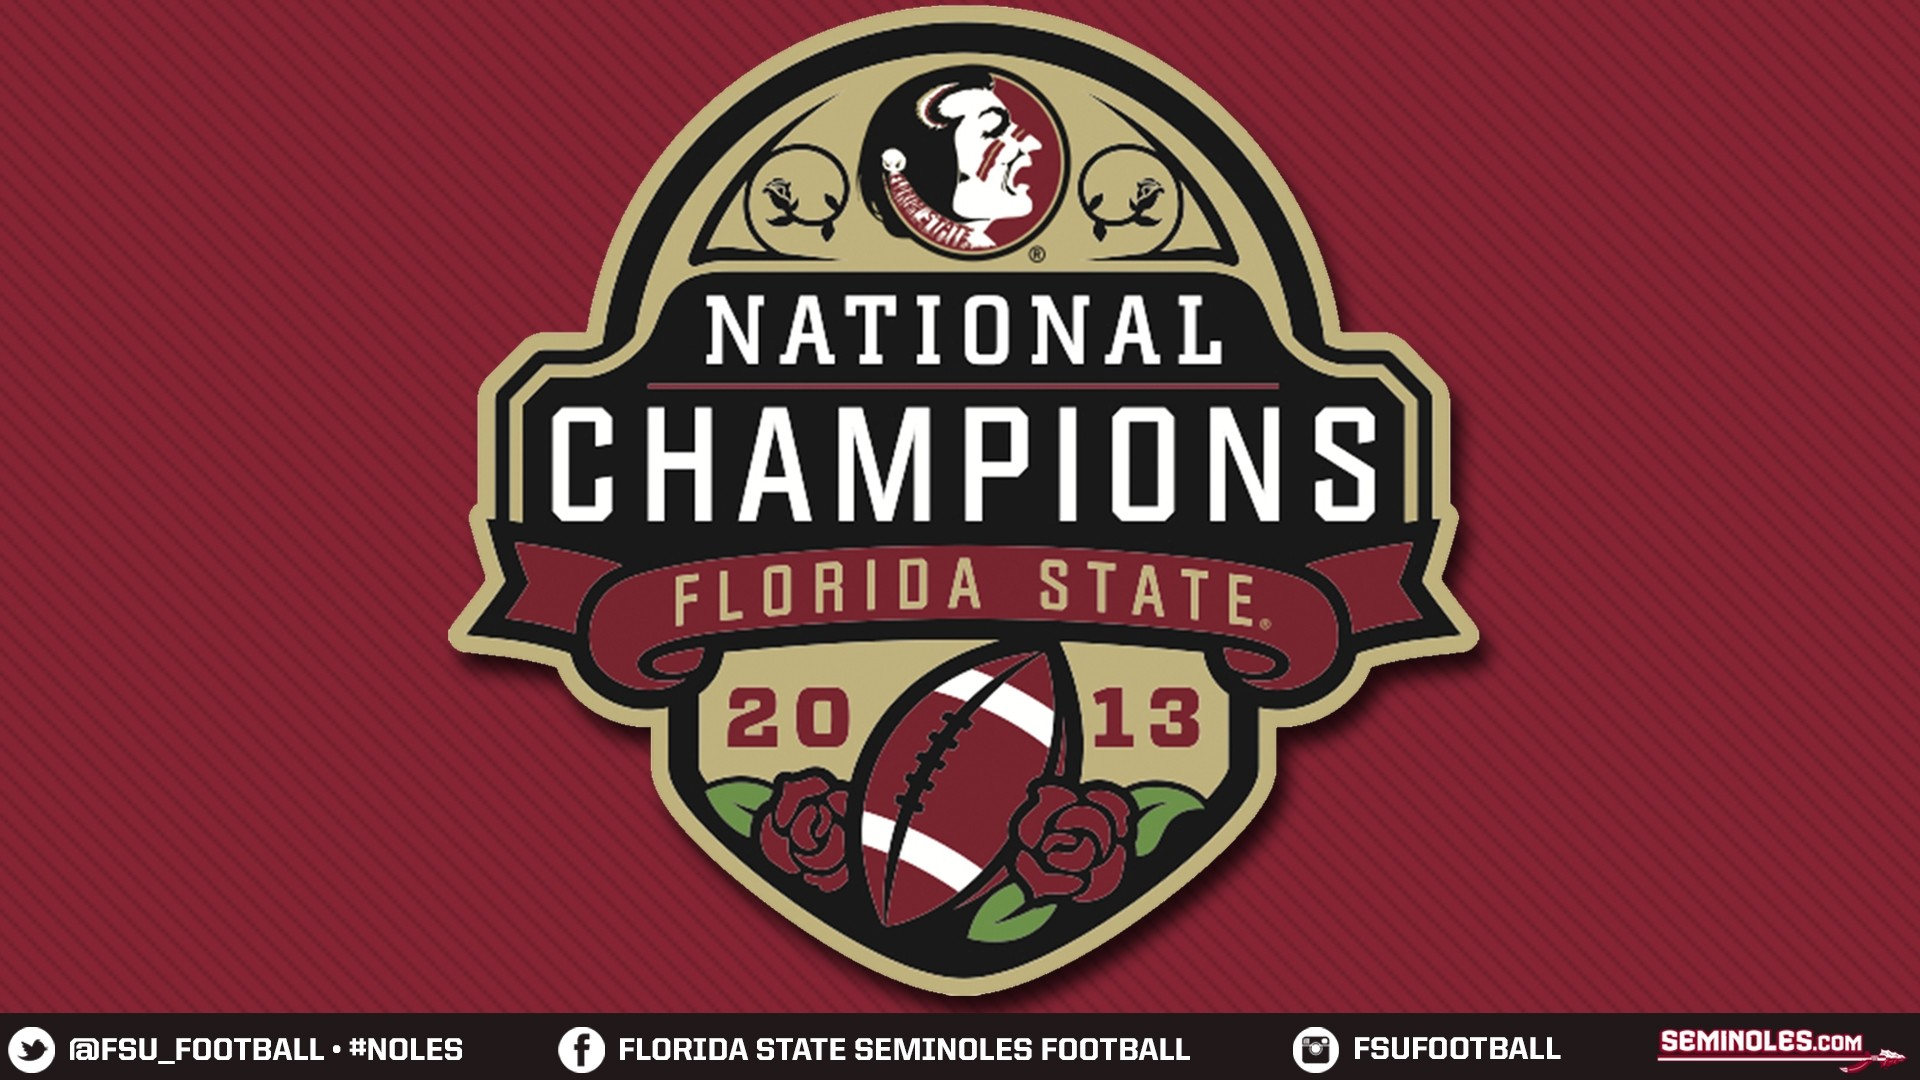 Florida State Seminoles Wallpaper Florida State Wallpaper